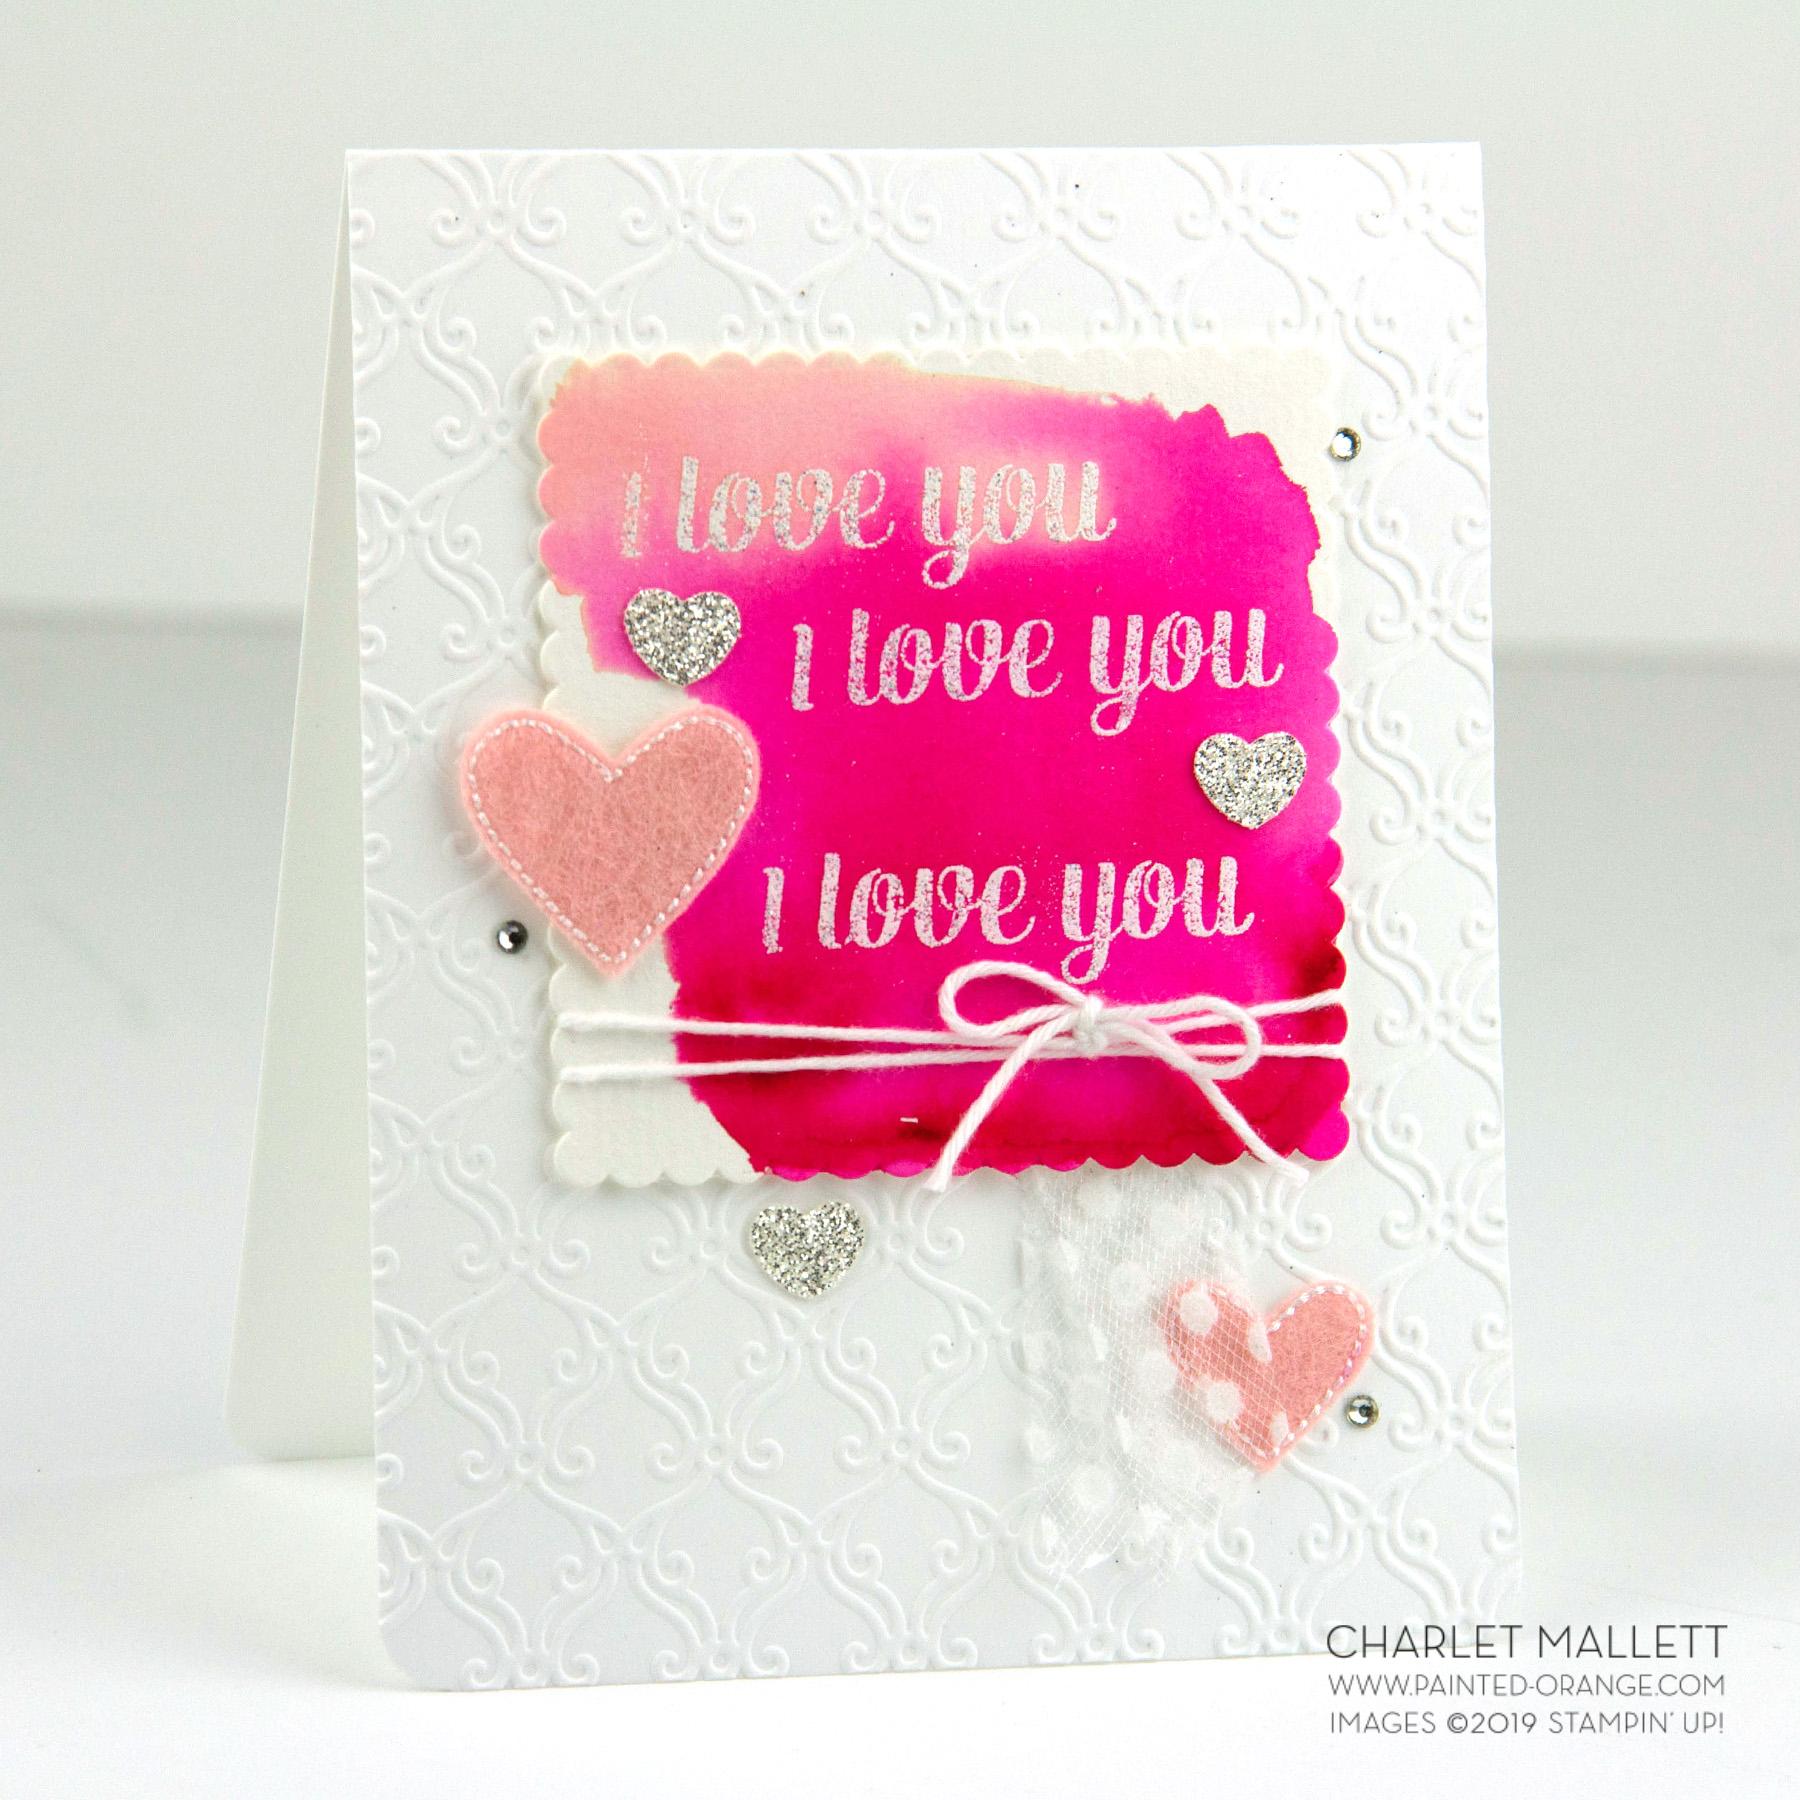 Genuine Gems - Charlet Mallett, Stampin' Up!